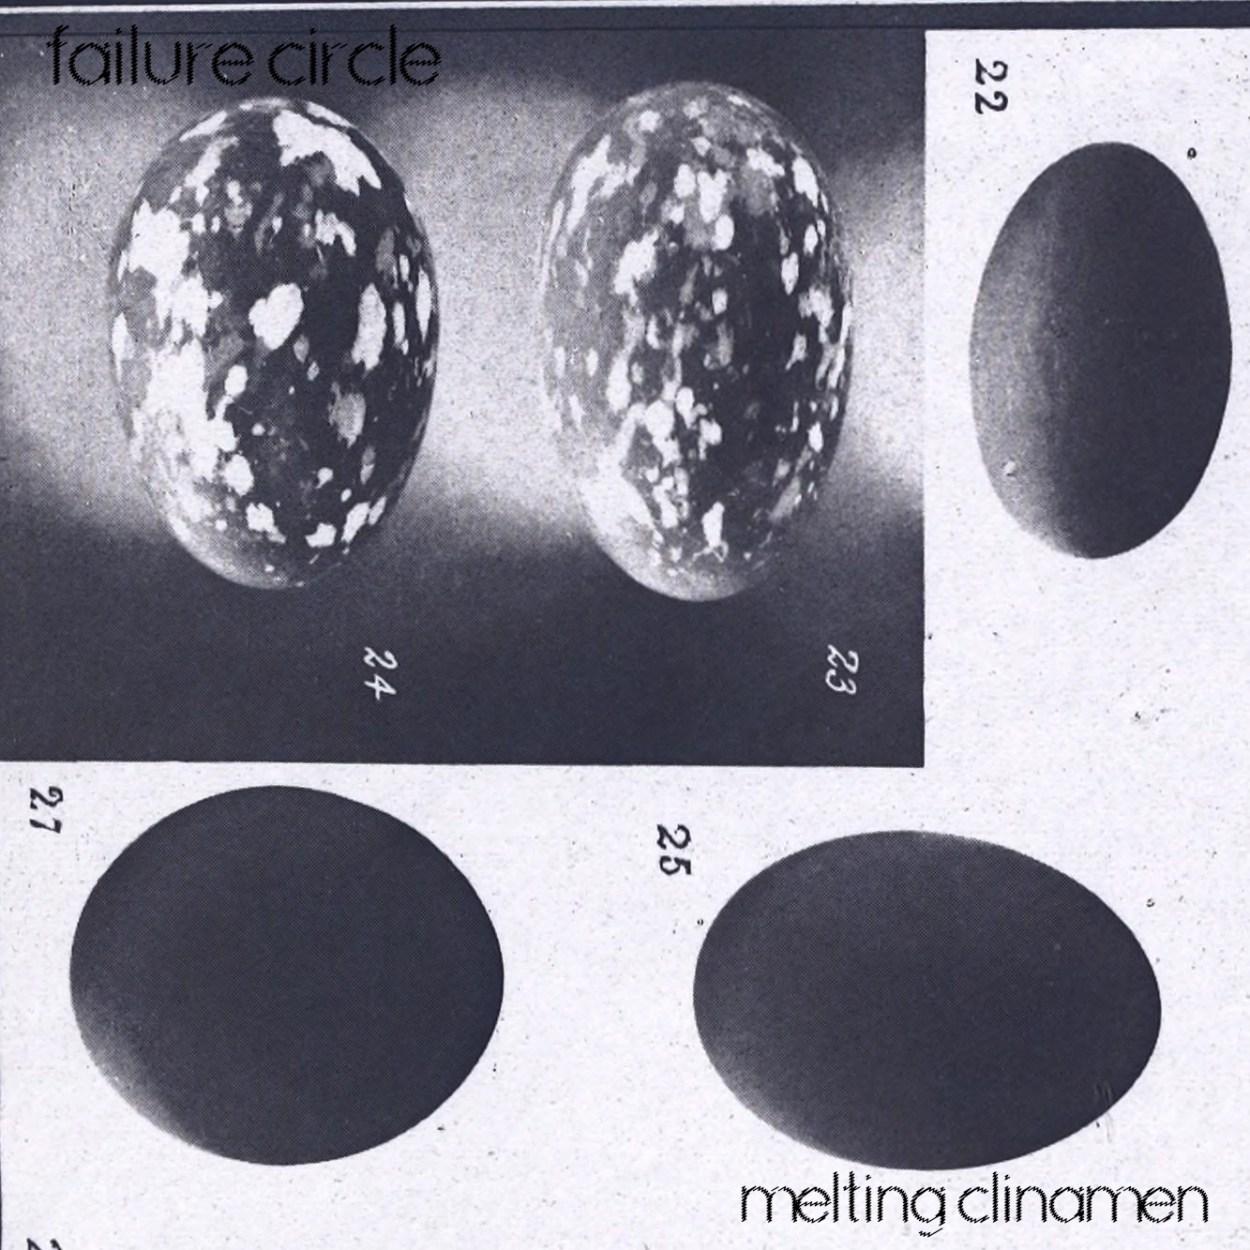 Failure Circle – Melting Clinamen